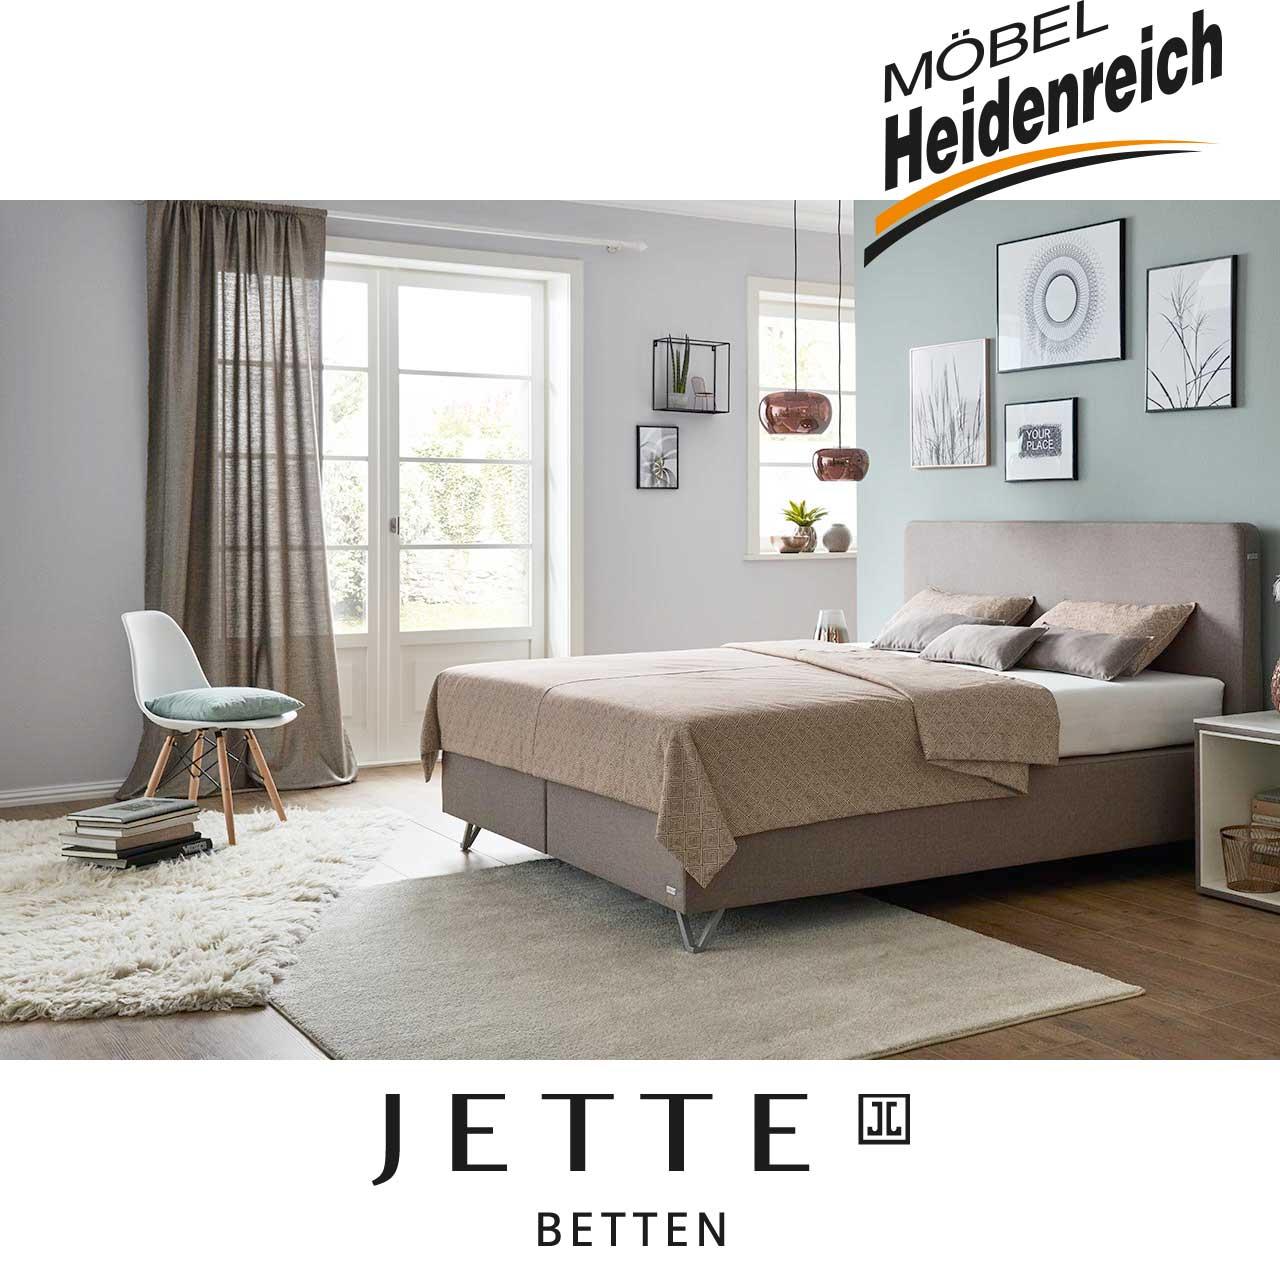 jette betten boxspringbett m bel heidenreich. Black Bedroom Furniture Sets. Home Design Ideas